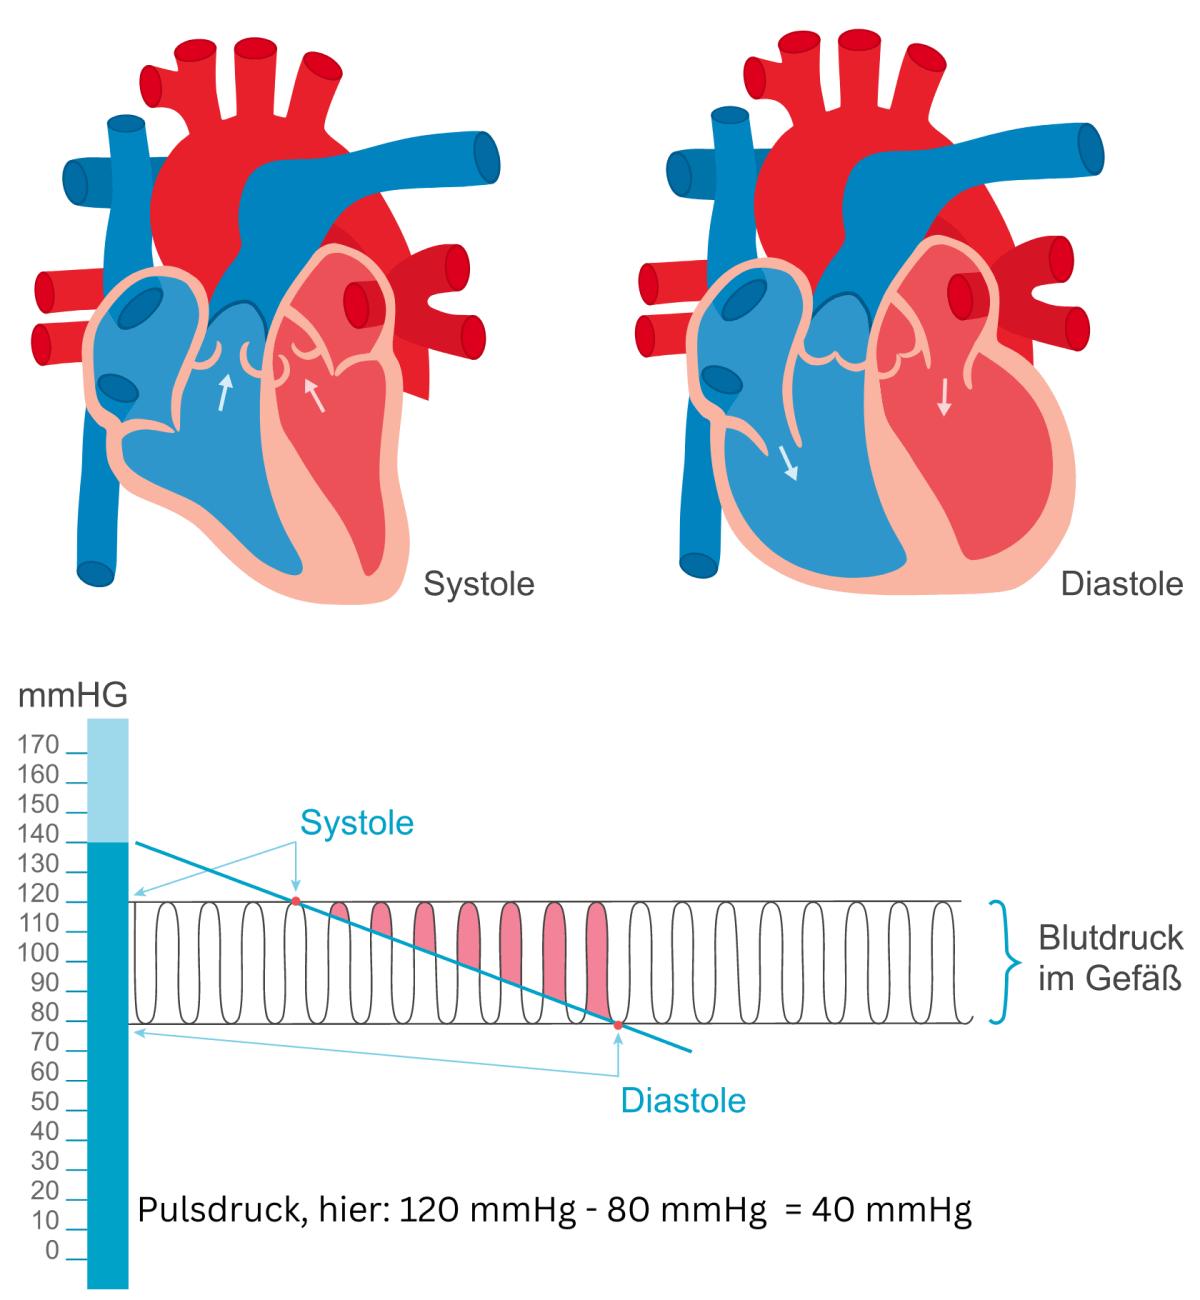 Diastolischer Blutdruck | BlutdruckDaten-Lexikon